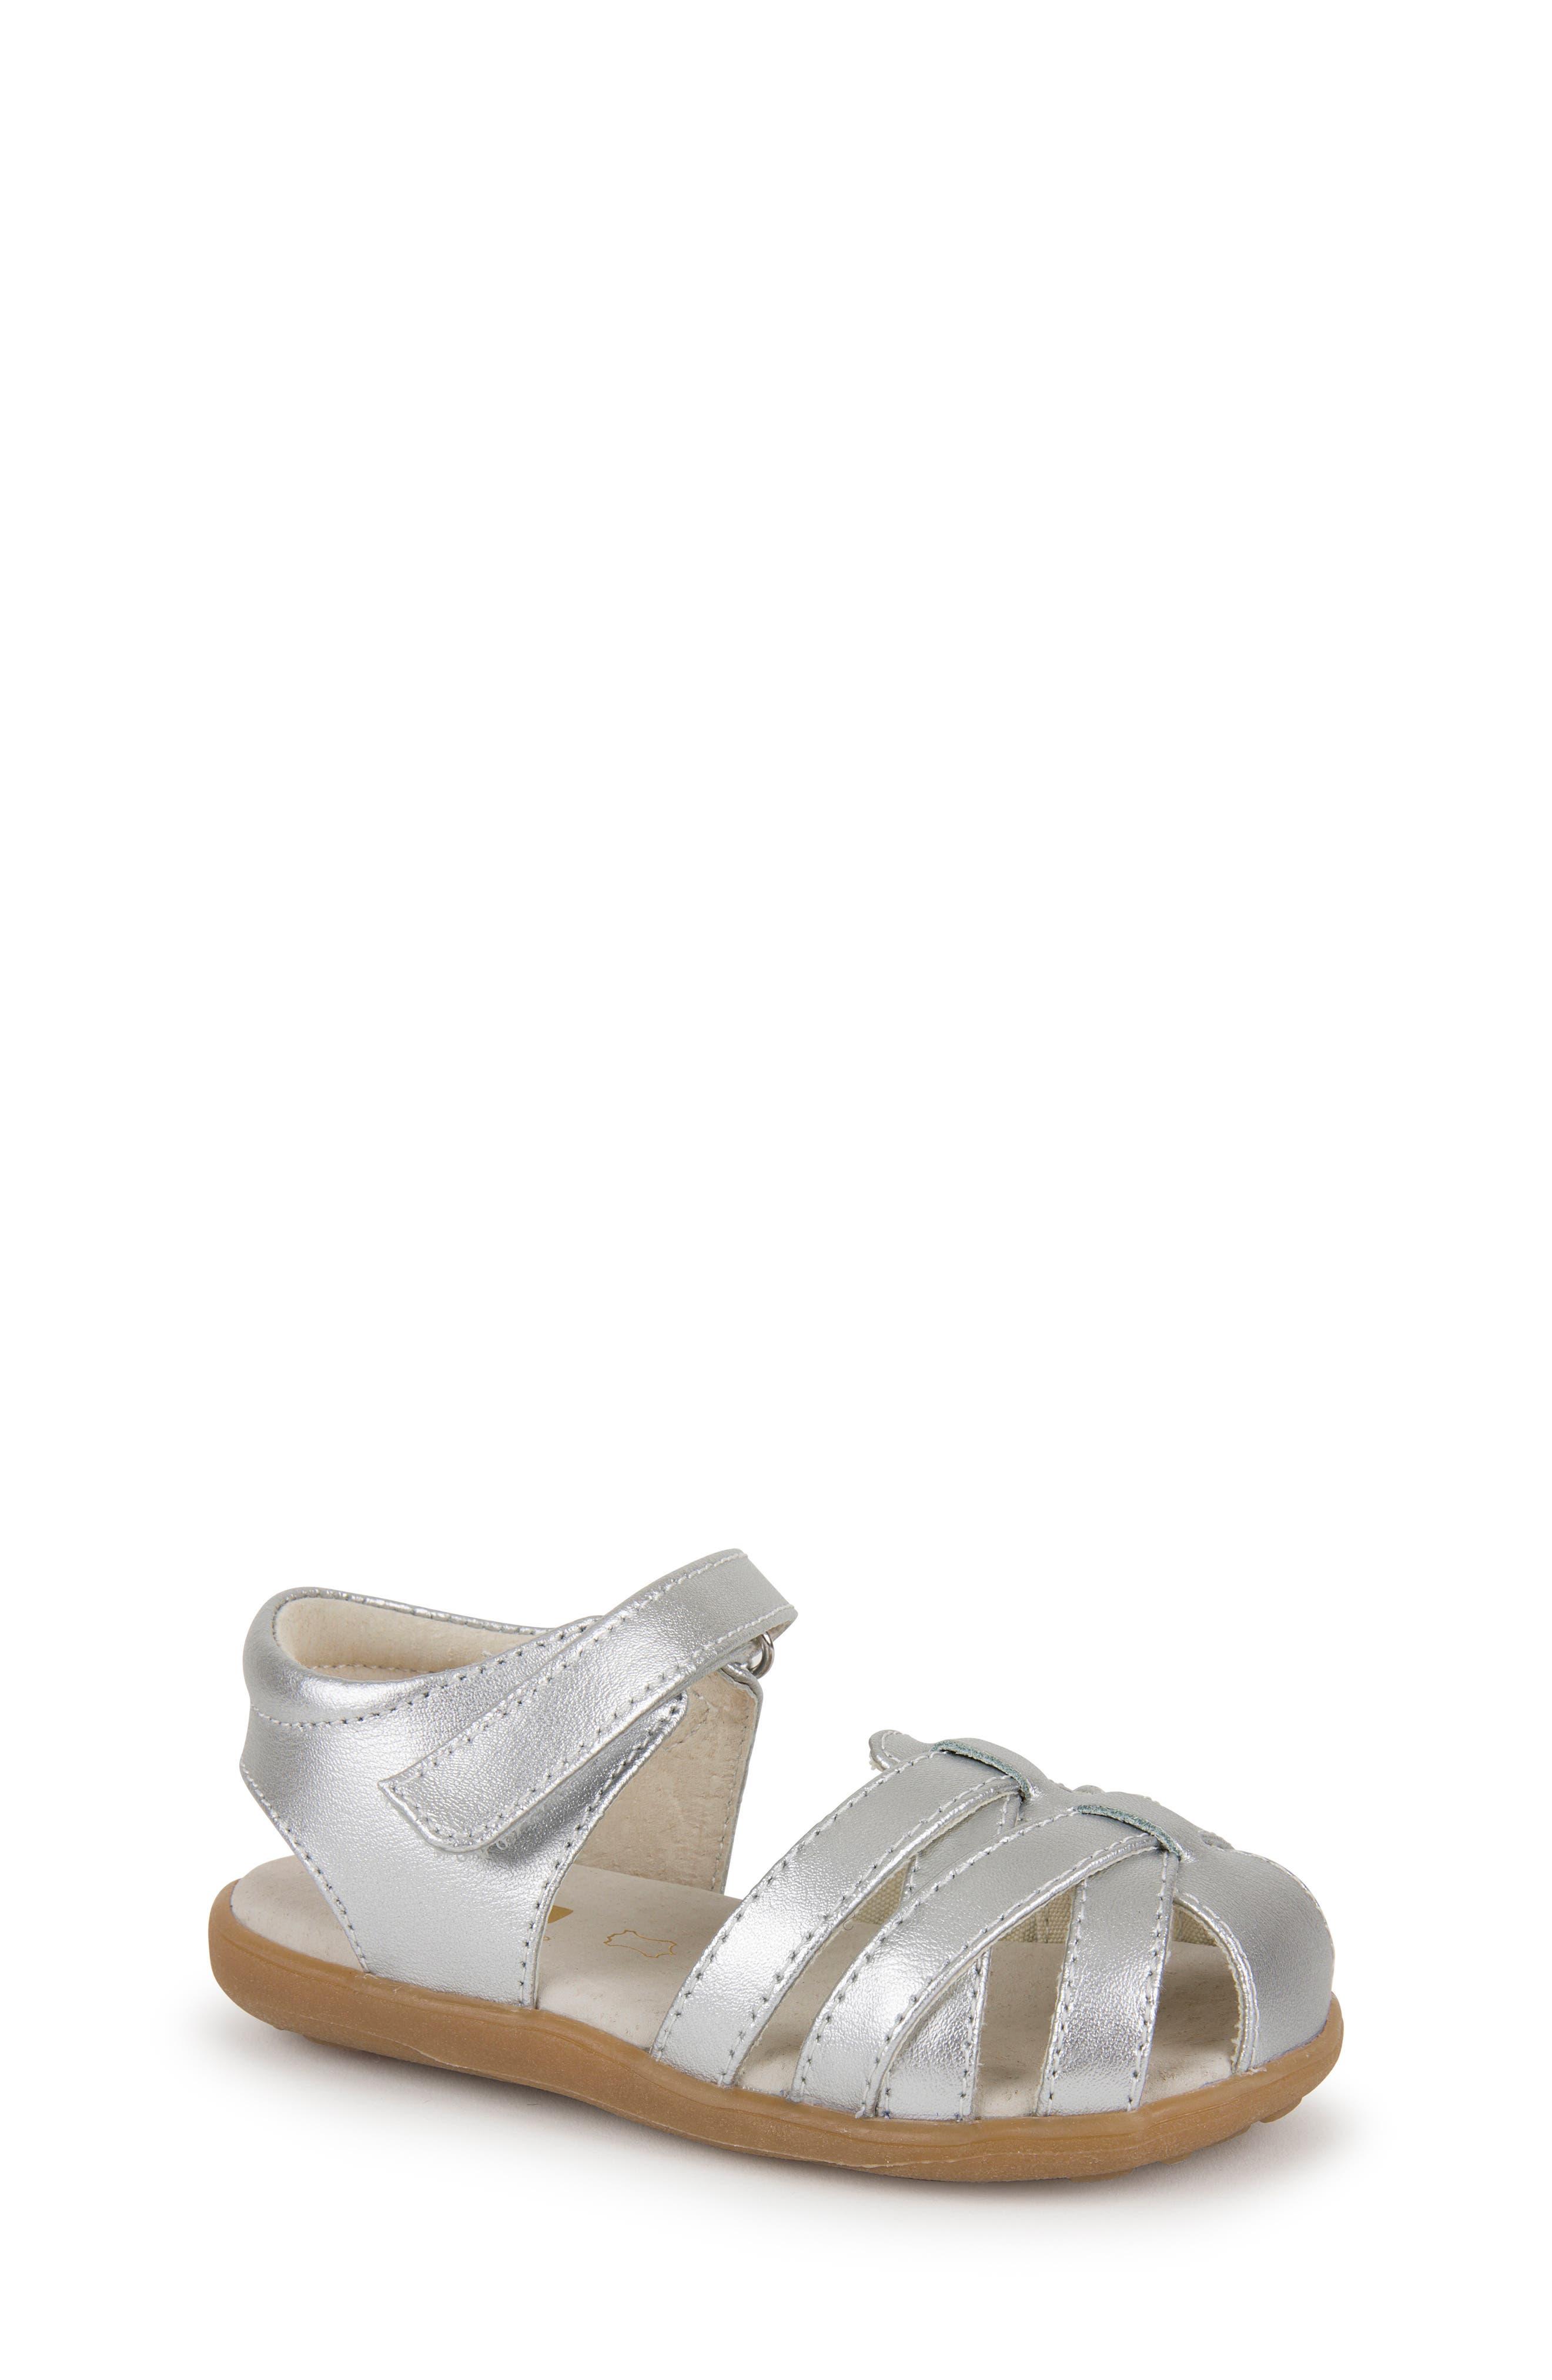 SEE KAI RUN Camila II Sandal, Main, color, SILVER